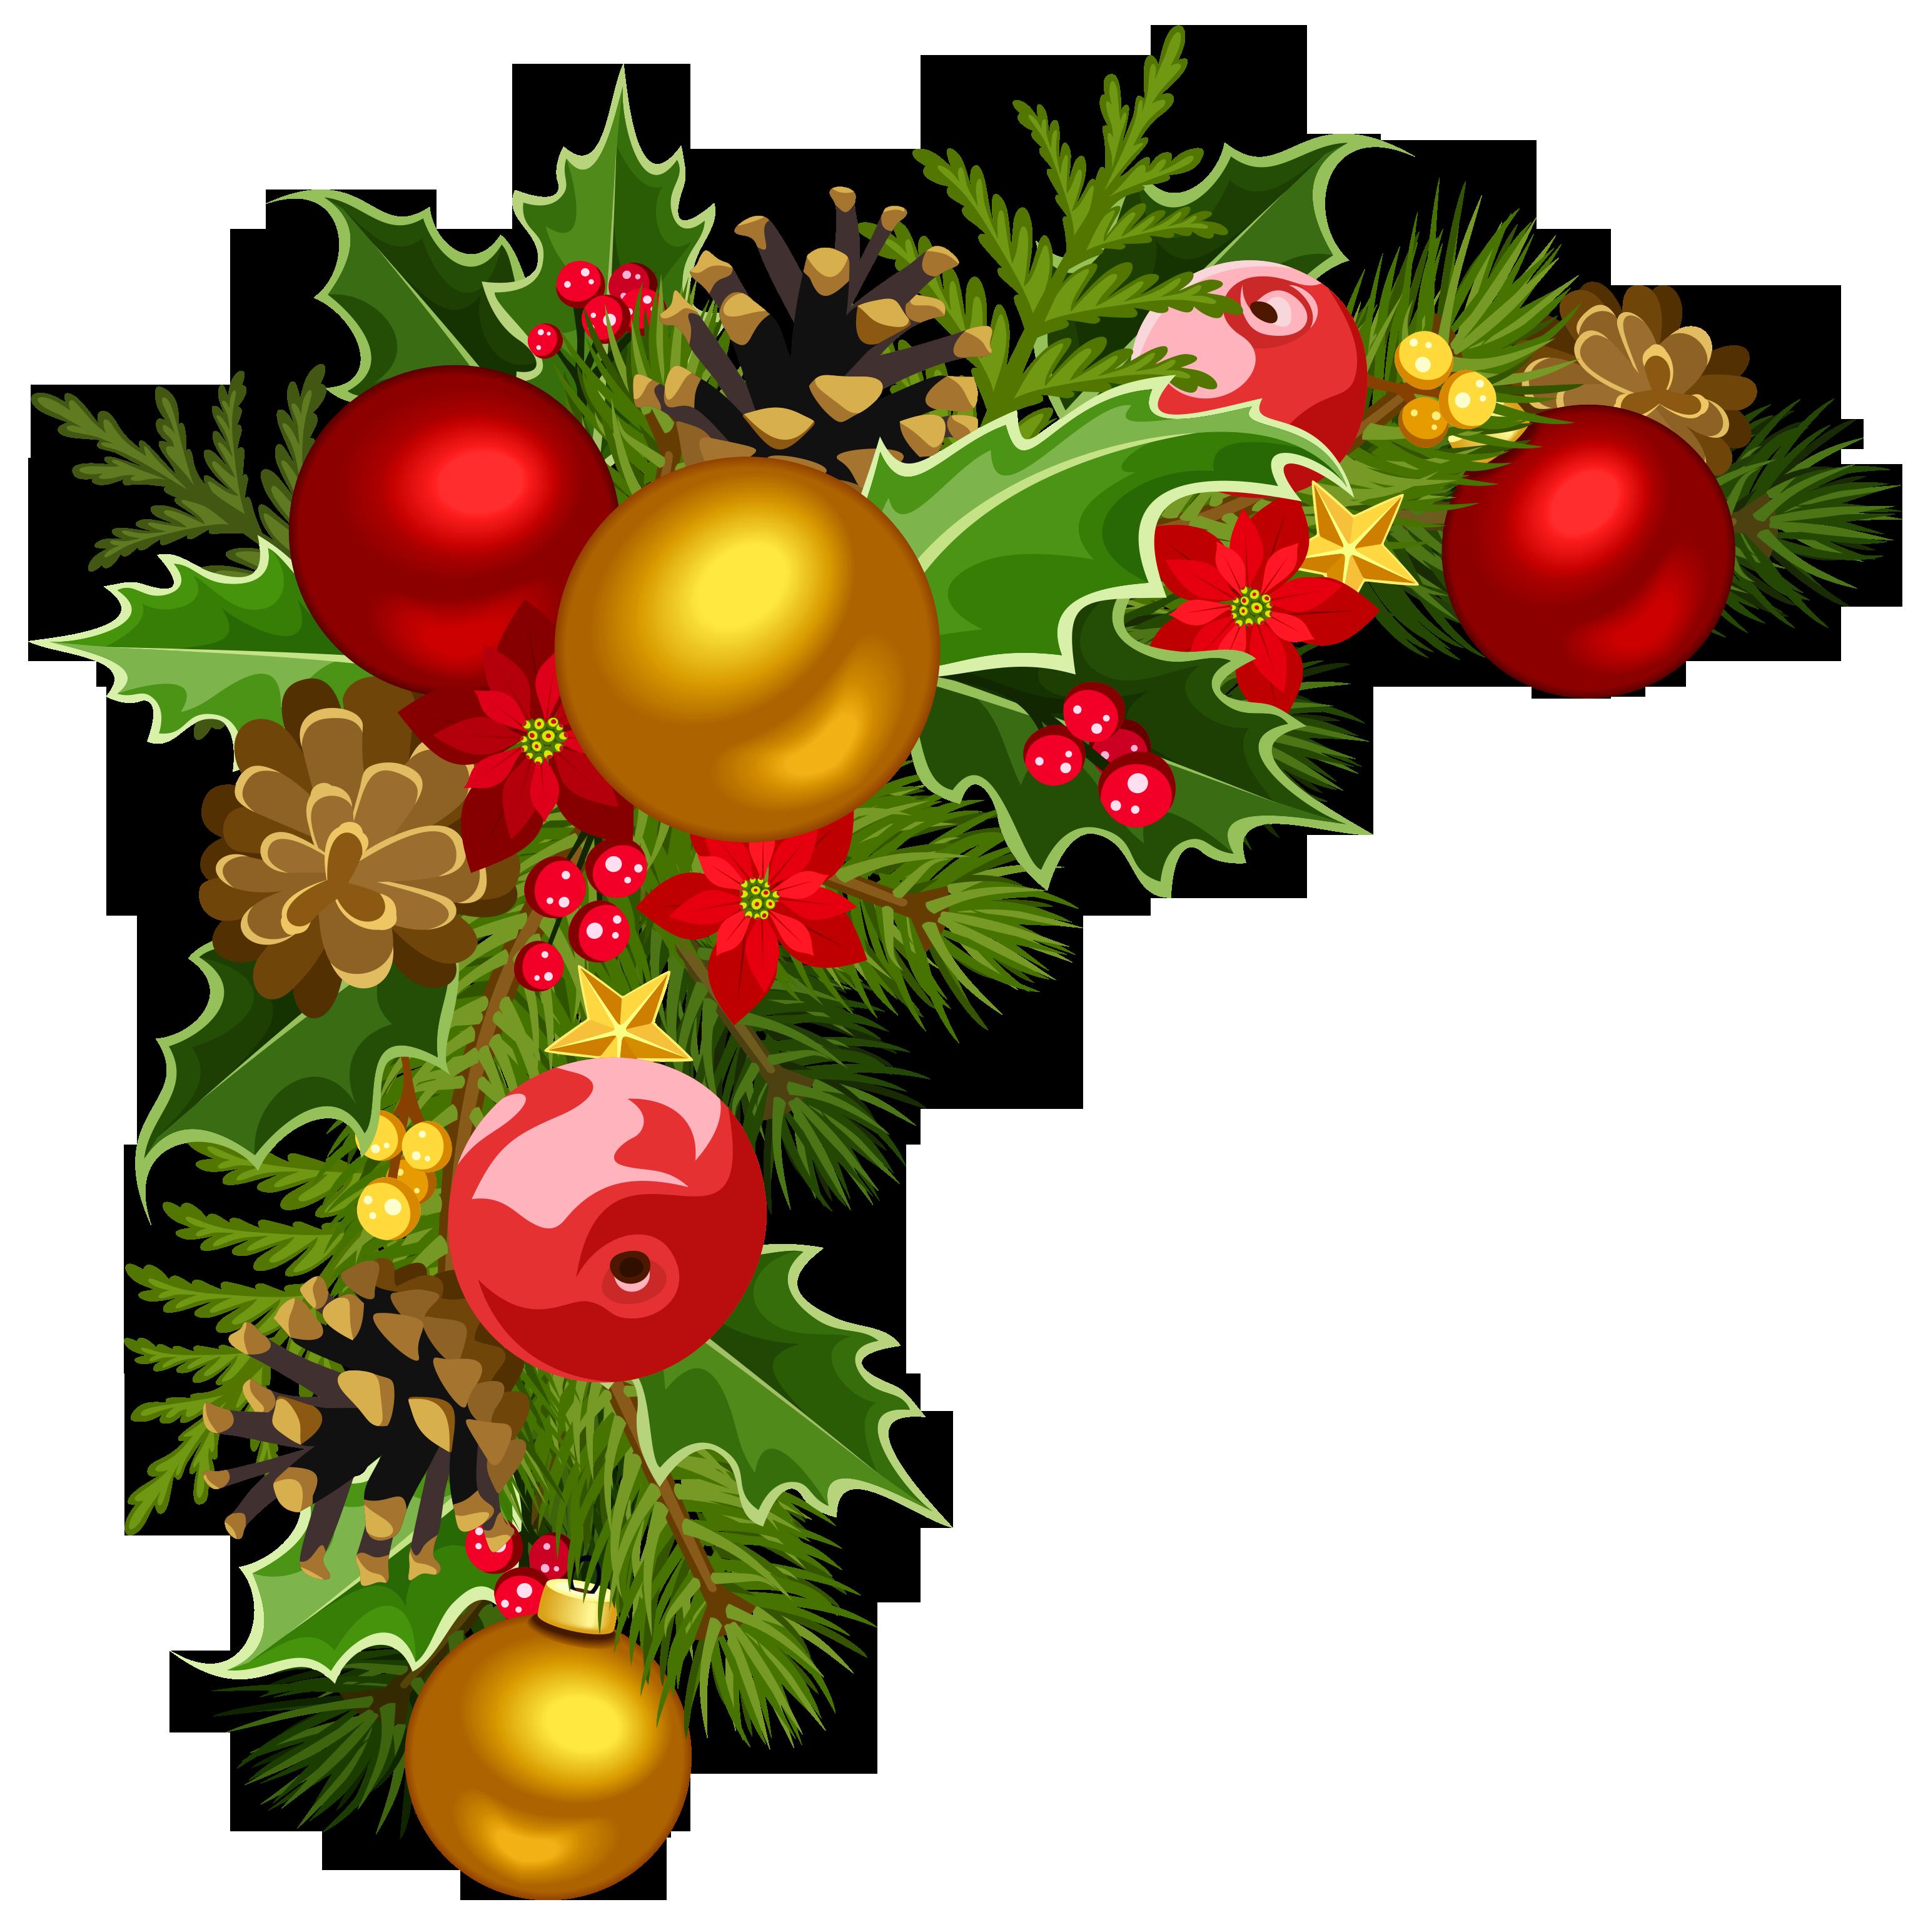 christmasdecorationscliparthappyholidayschristmas